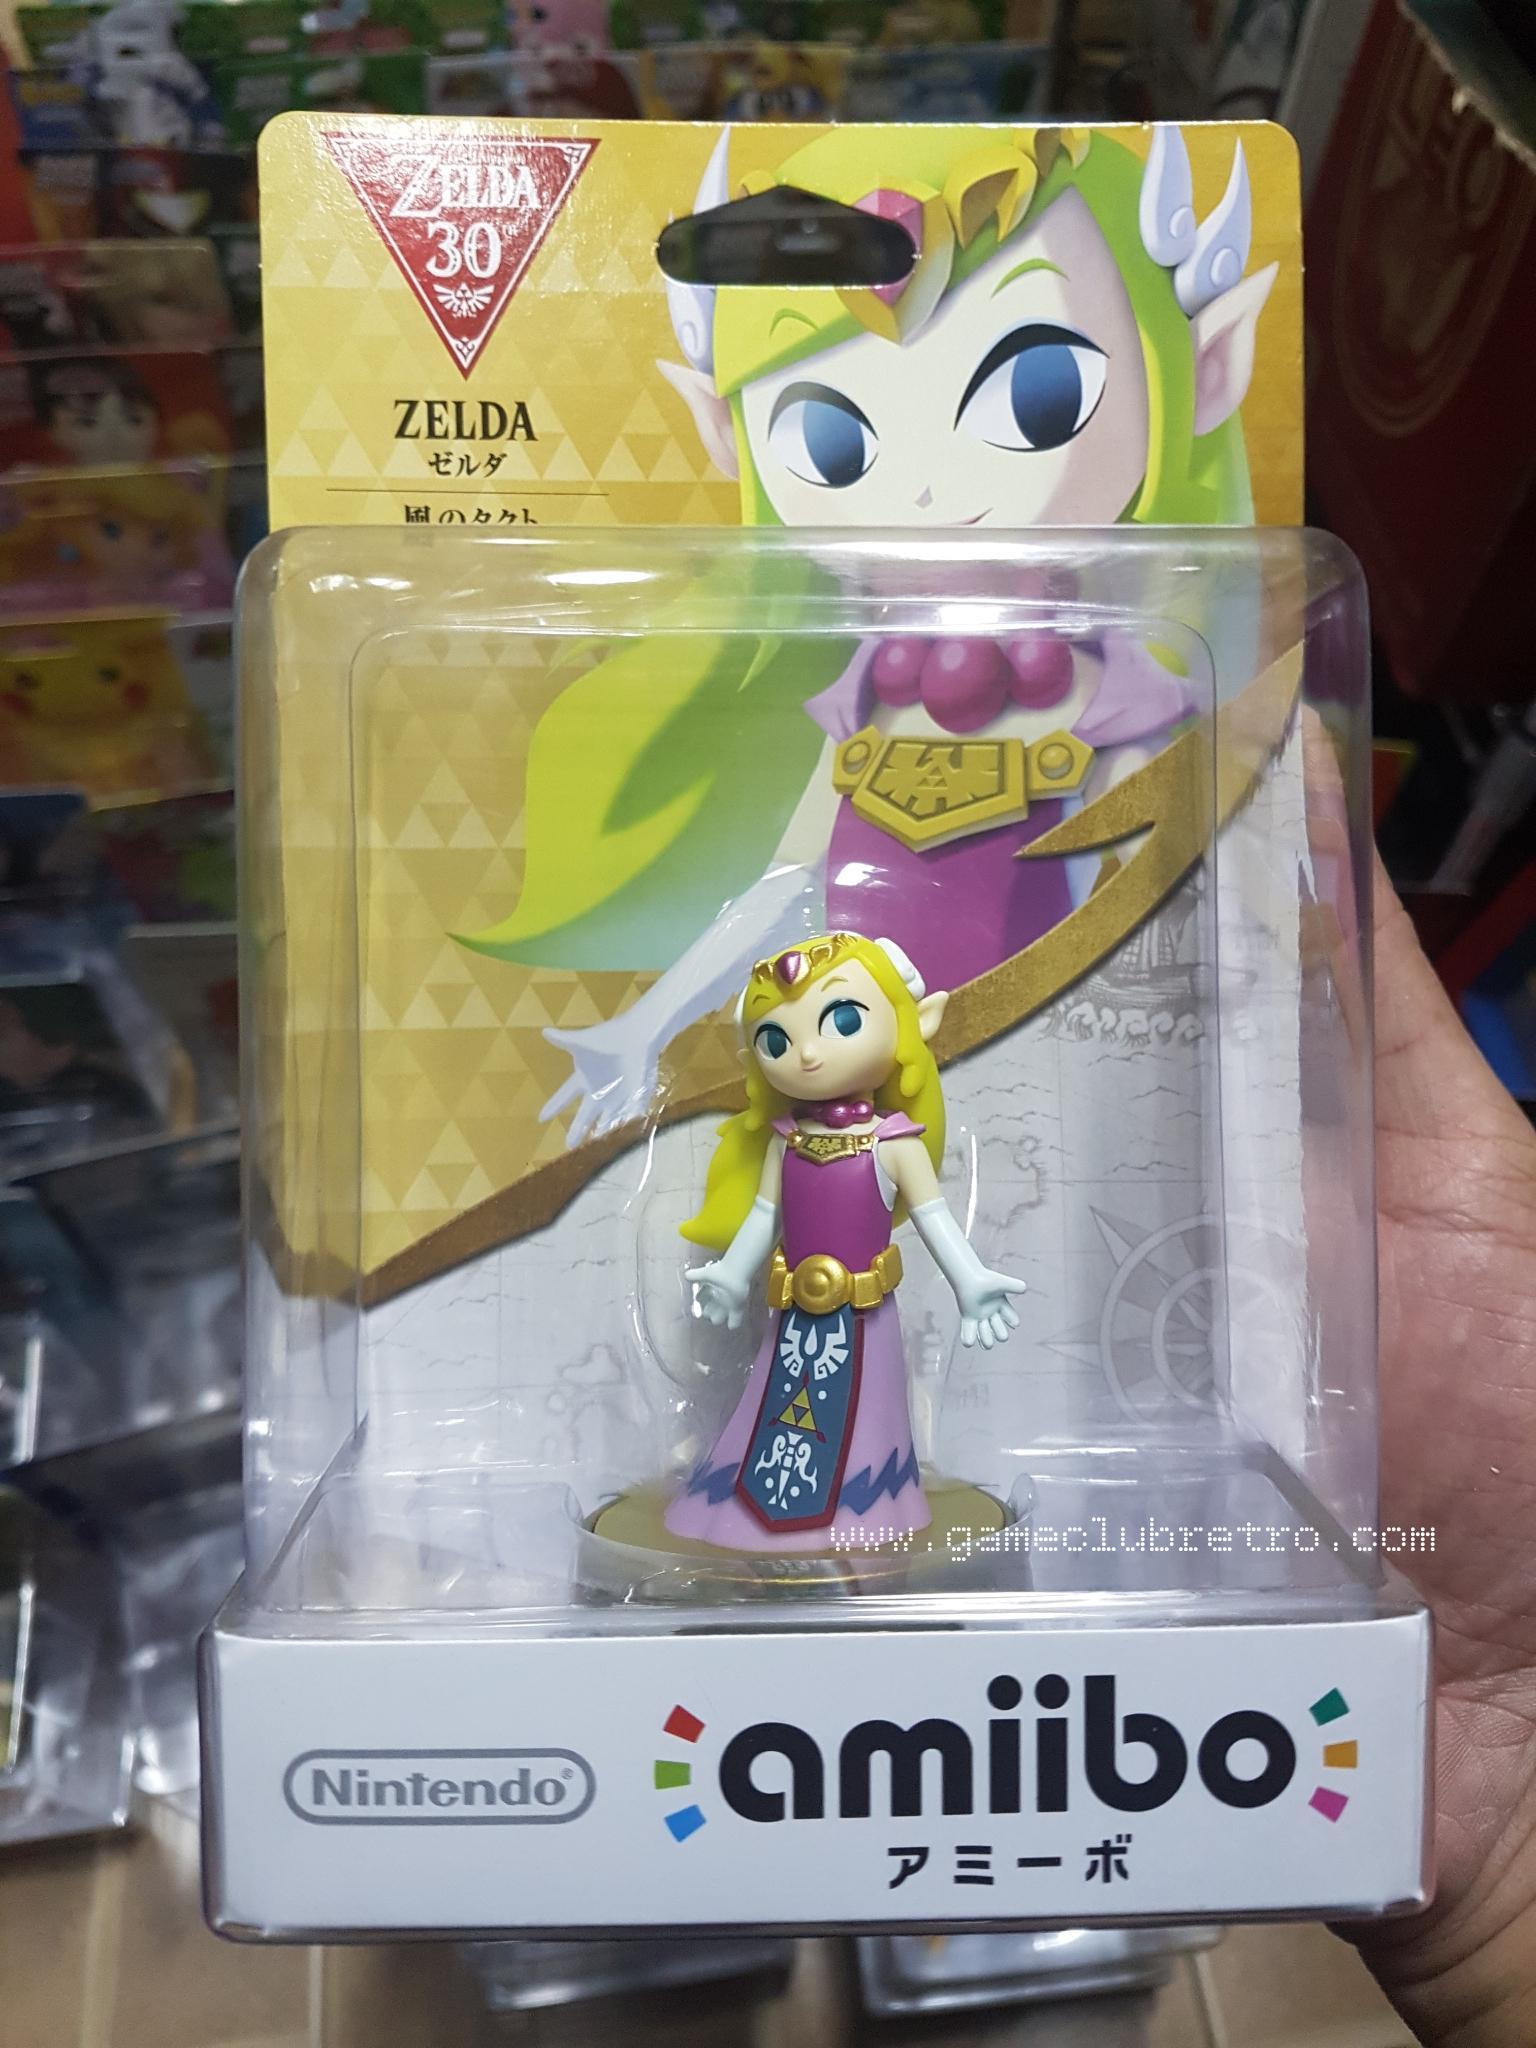 Amiibo Toon Zelda 30th มือ 1